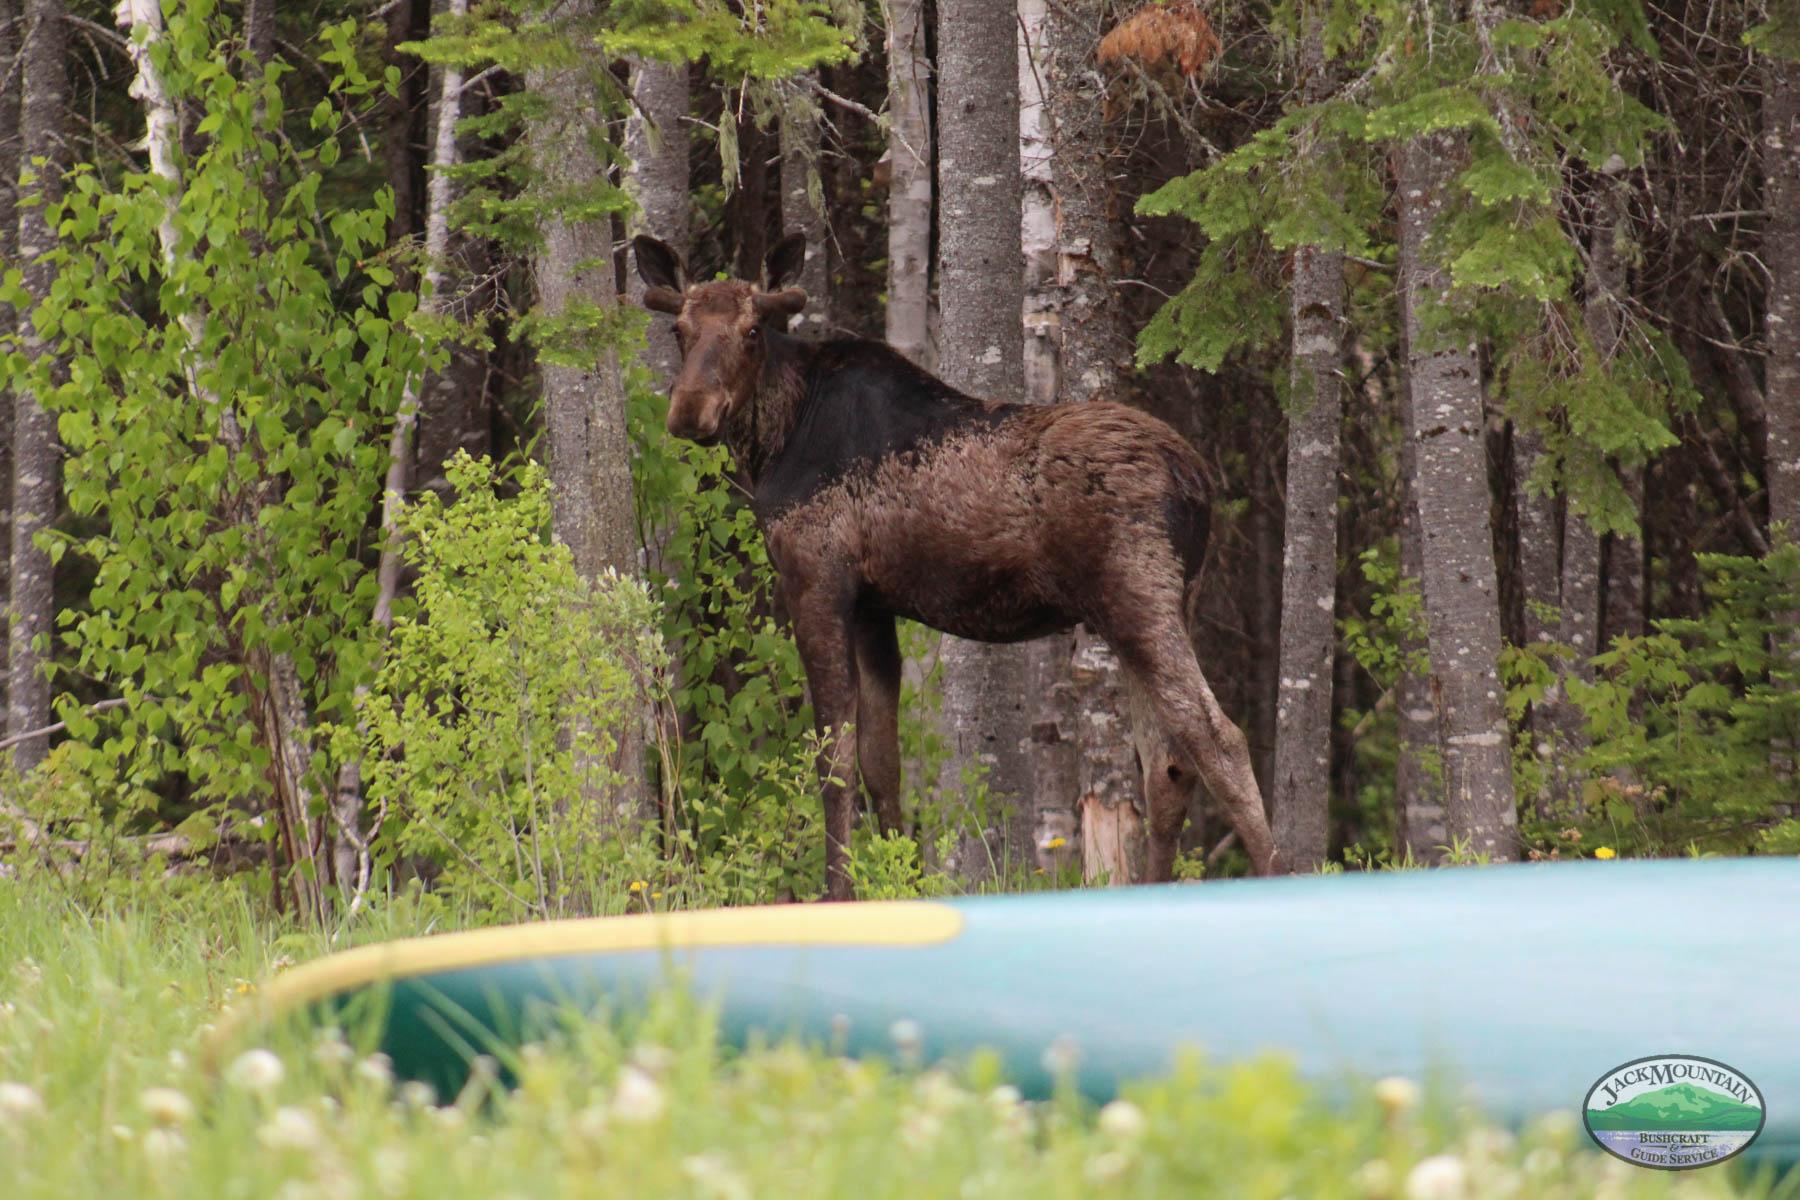 Fall Wilderness Bushcraft Semester Update: 4 Spots Remaining